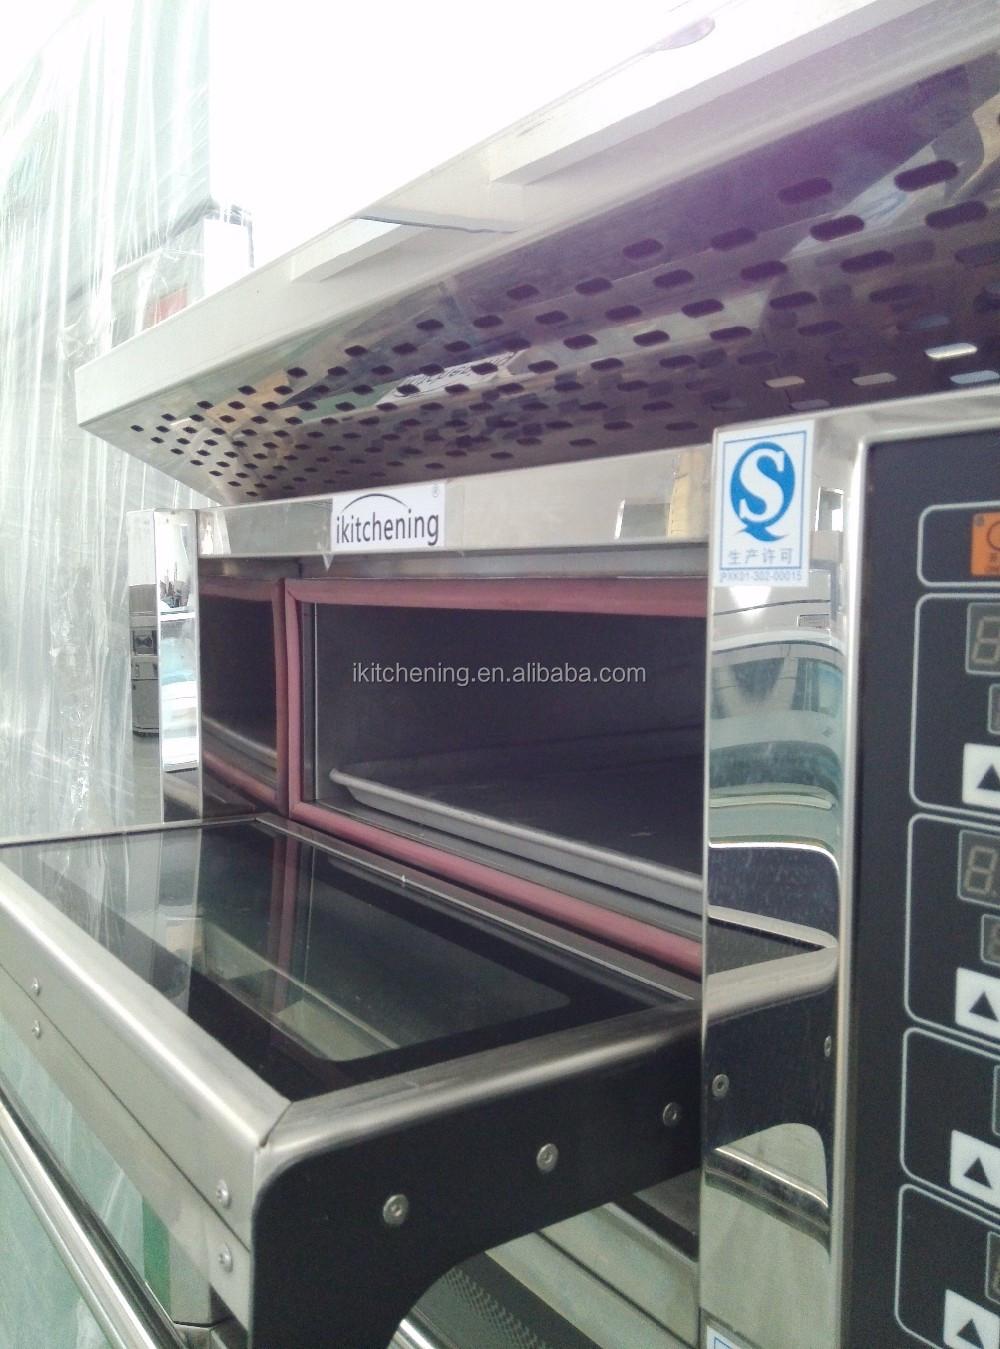 Countertop Oven Energy Efficient : Energy Saving Toaster Oven - Buy Toaster Oven,High-speed Toaster Oven ...